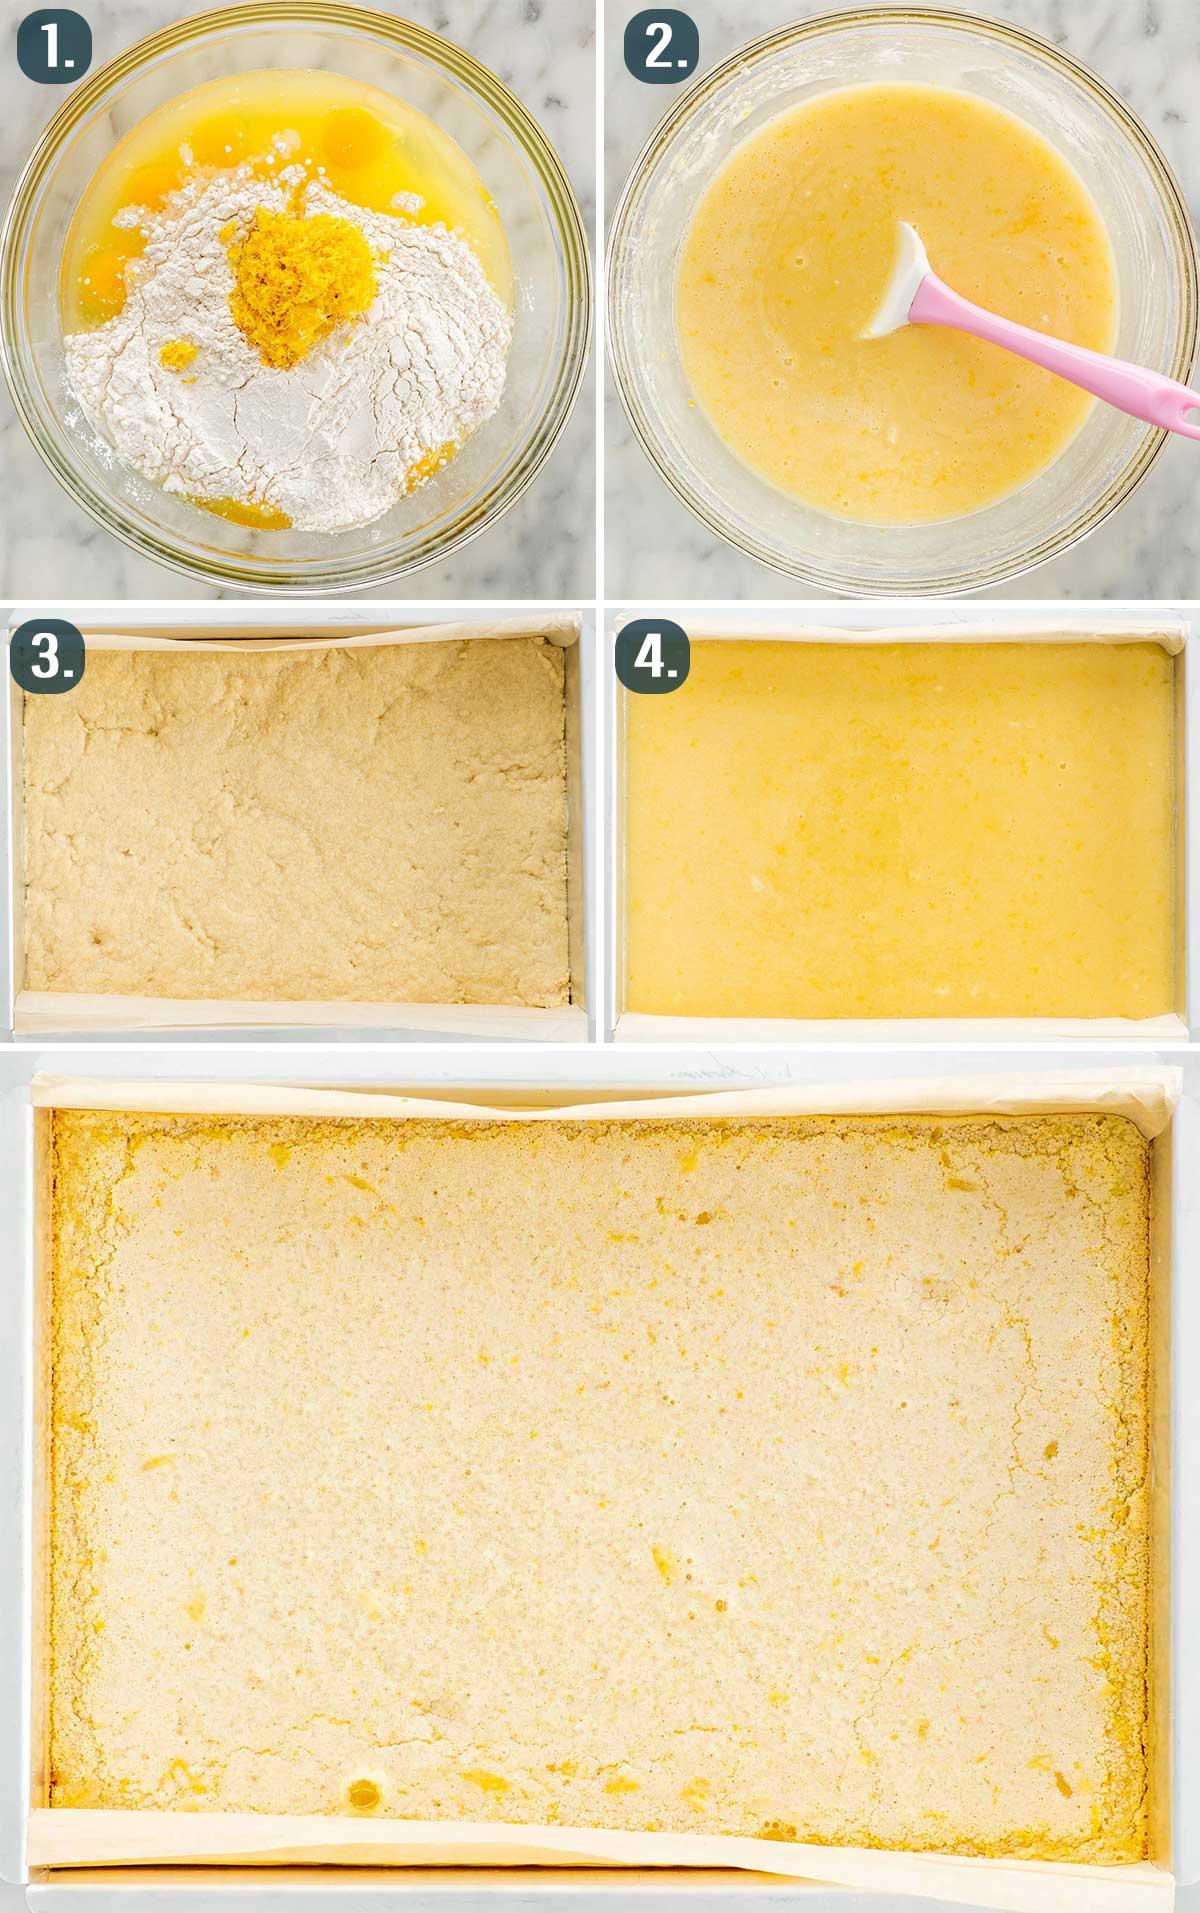 process shots showing how to make lemon bars.